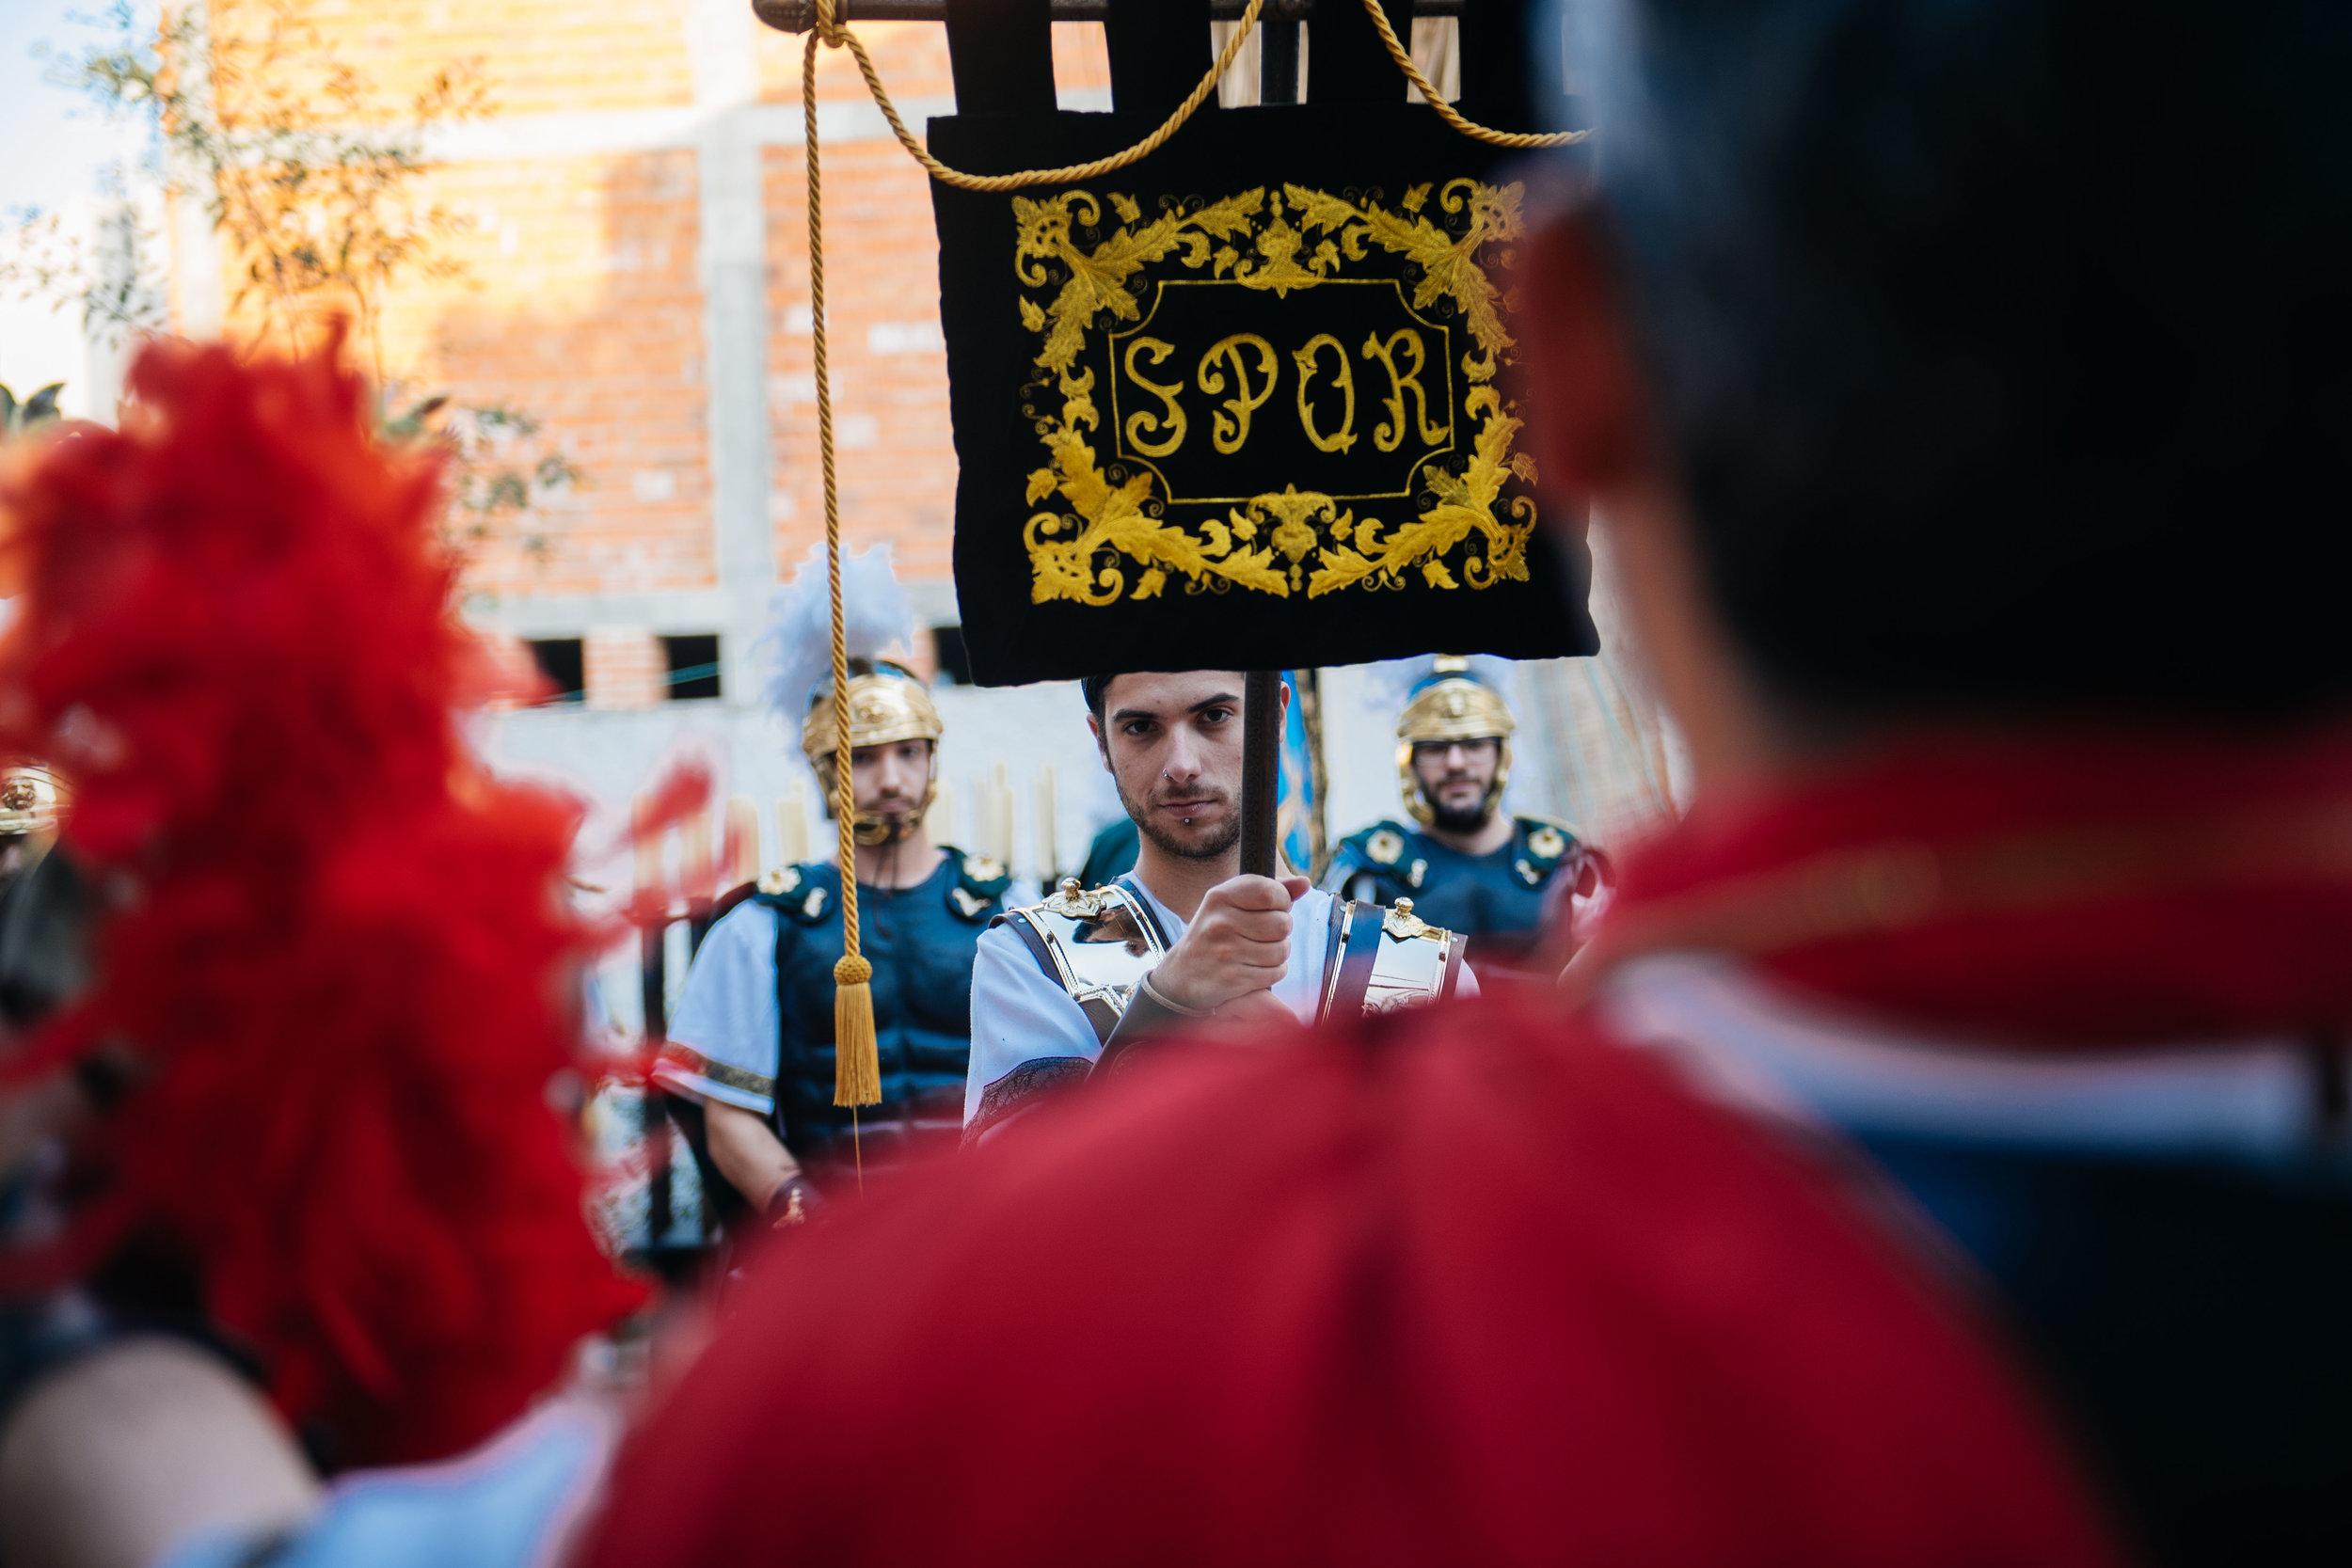 Representing Roman legionnaires, man holds banner with the initials for Senatus Populusque Romanus, the Roman senate and people.